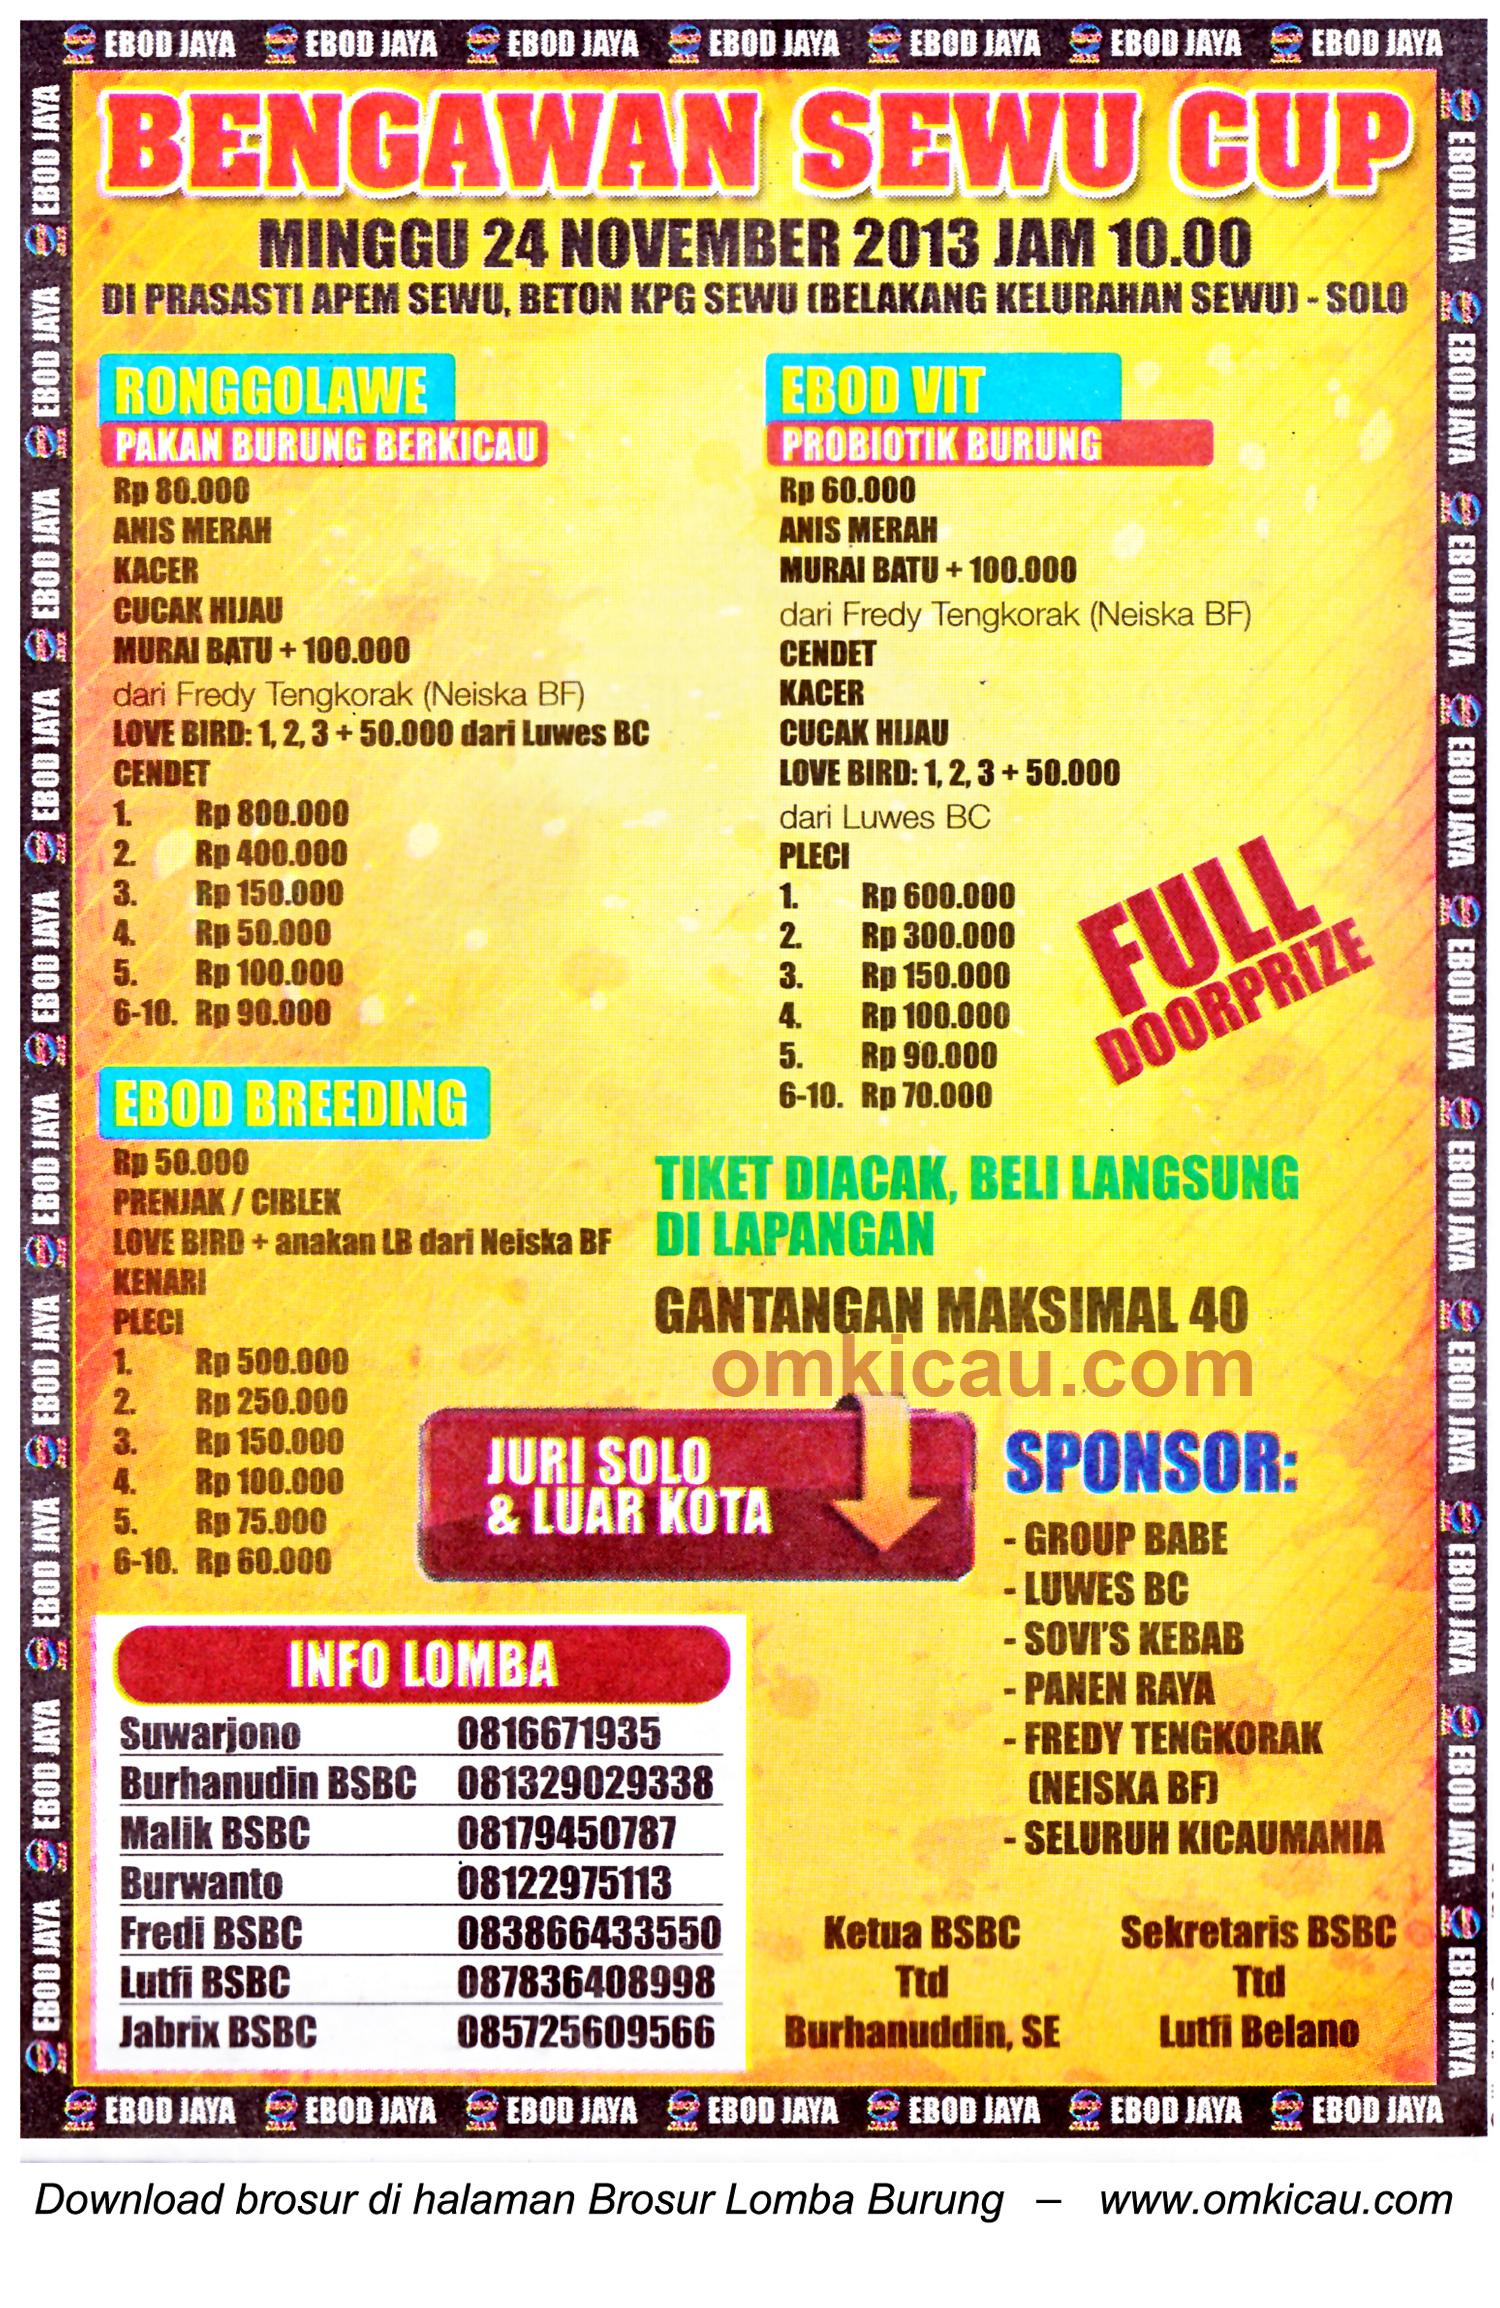 Brosur Lomba Burung Berkicau Bengawan Sewu Cup, Solo, 24 November 2013